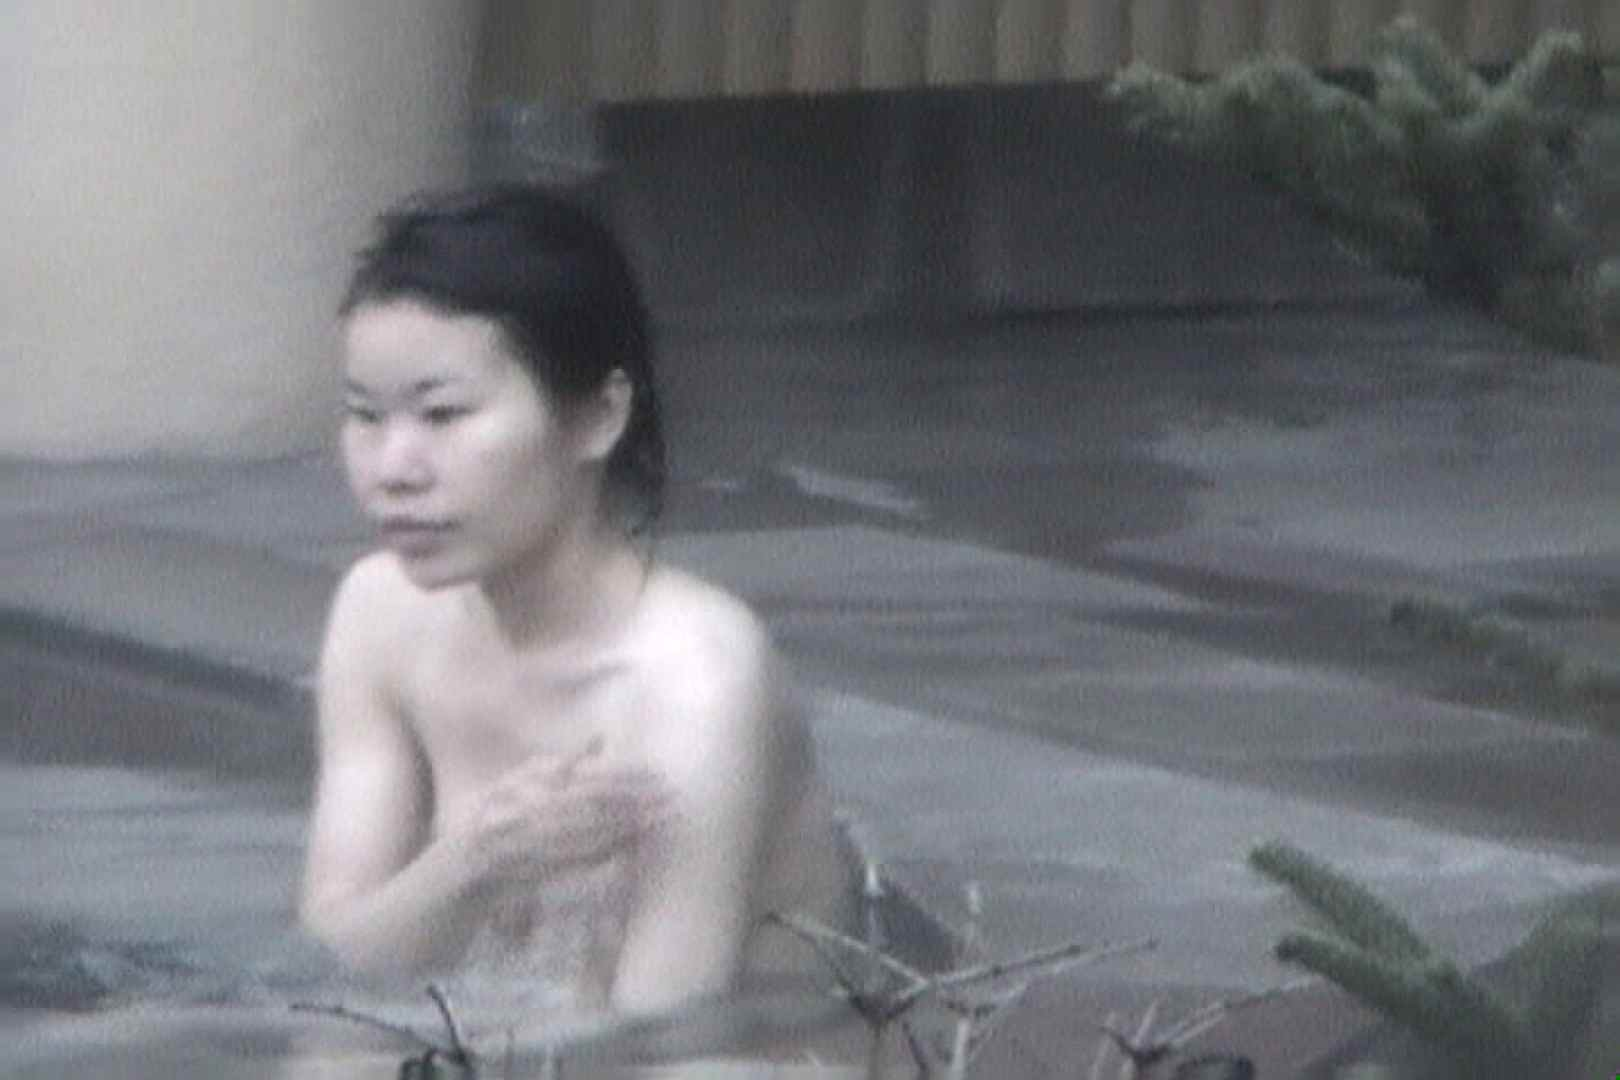 Aquaな露天風呂Vol.556 露天風呂編 | 盗撮シリーズ  99PIX 33